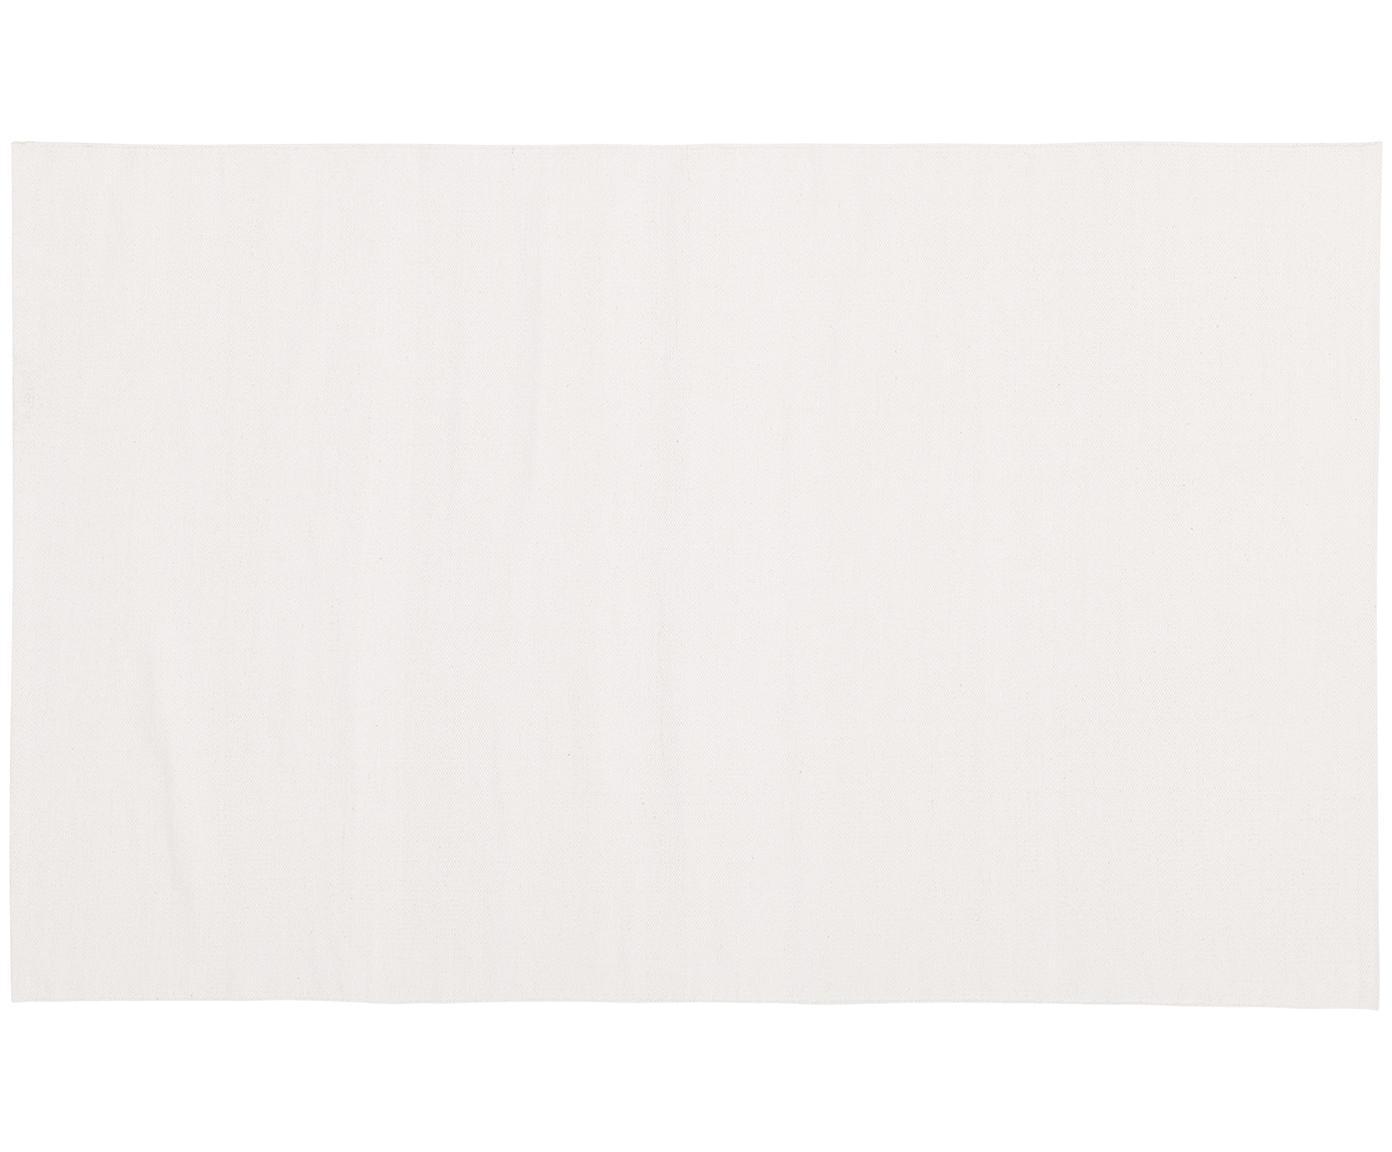 Alfombra artesanal de algodón Agneta, Algodón, Blanco crema, An 50 x L 80 cm (Tamaño XXS)